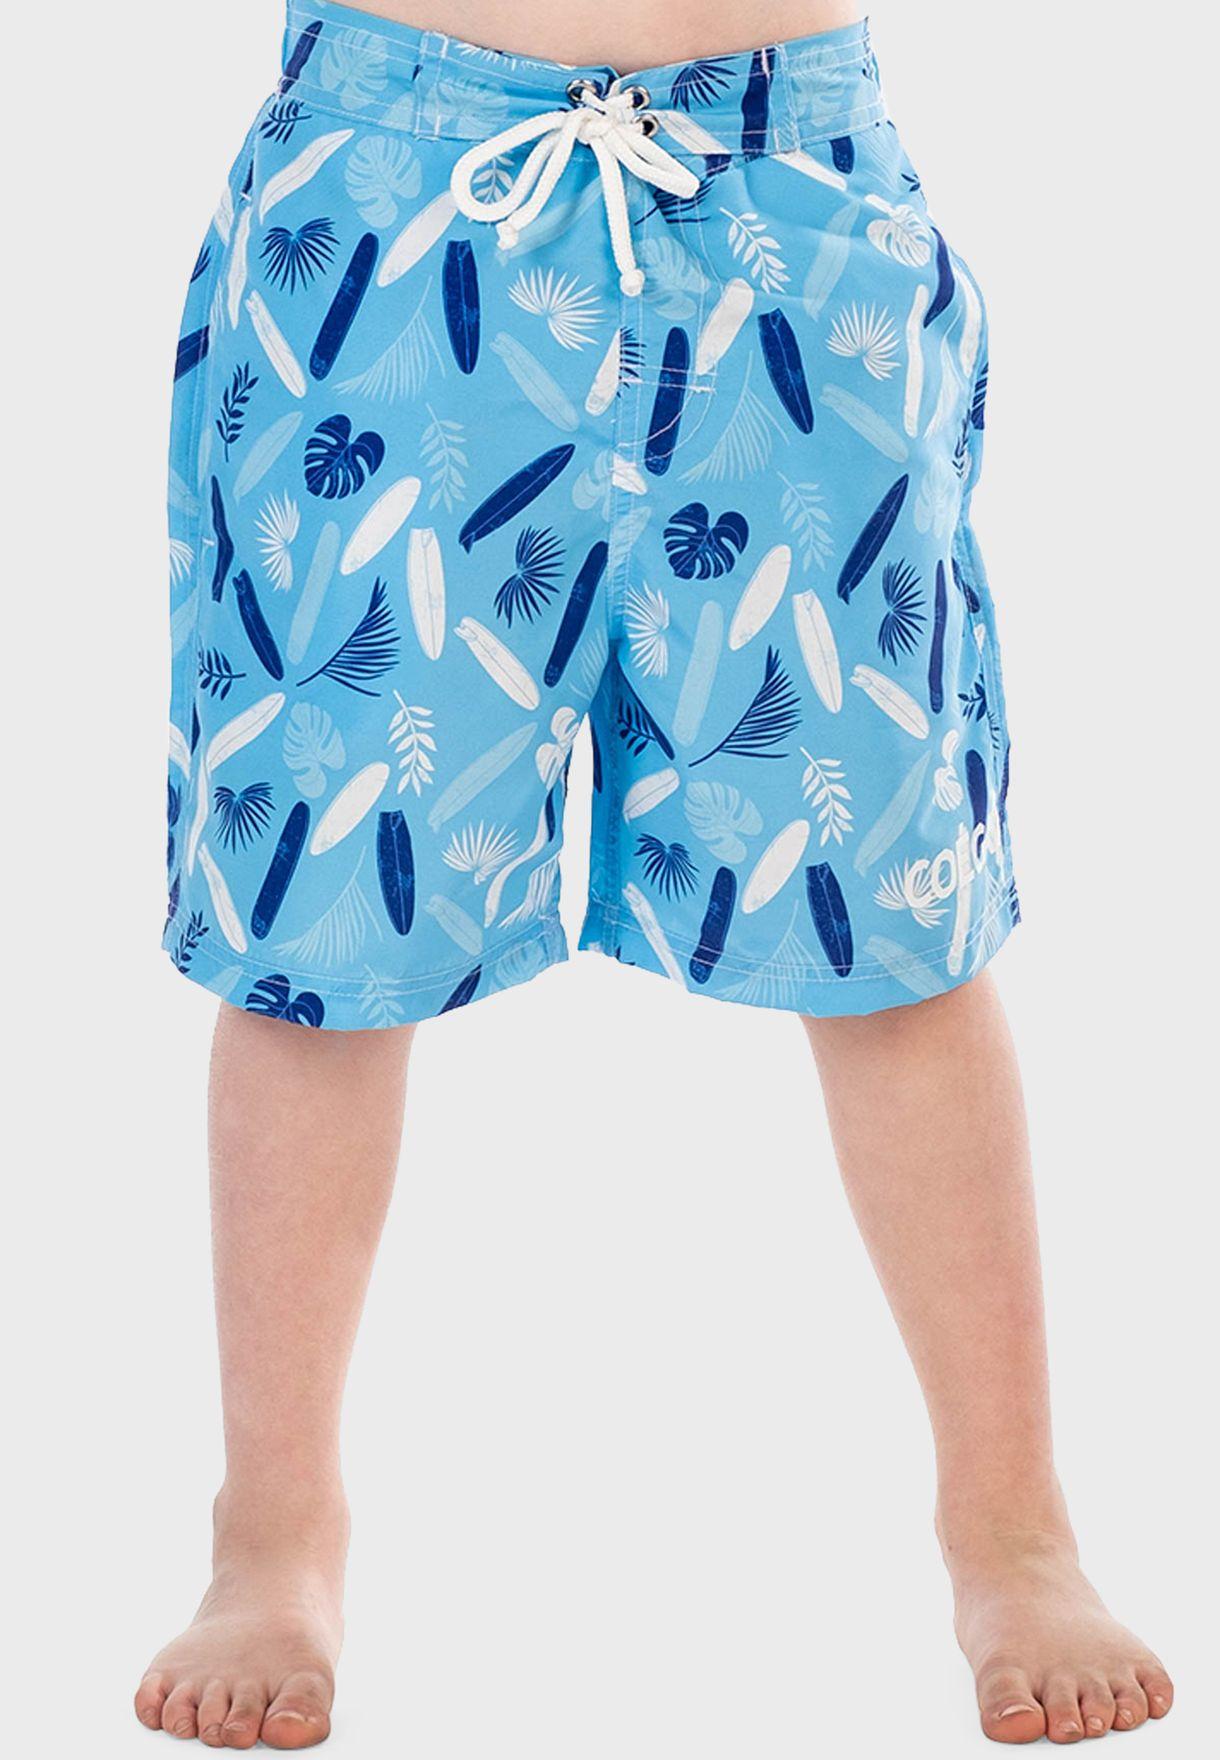 Youth Surfer Print Swim Shorts